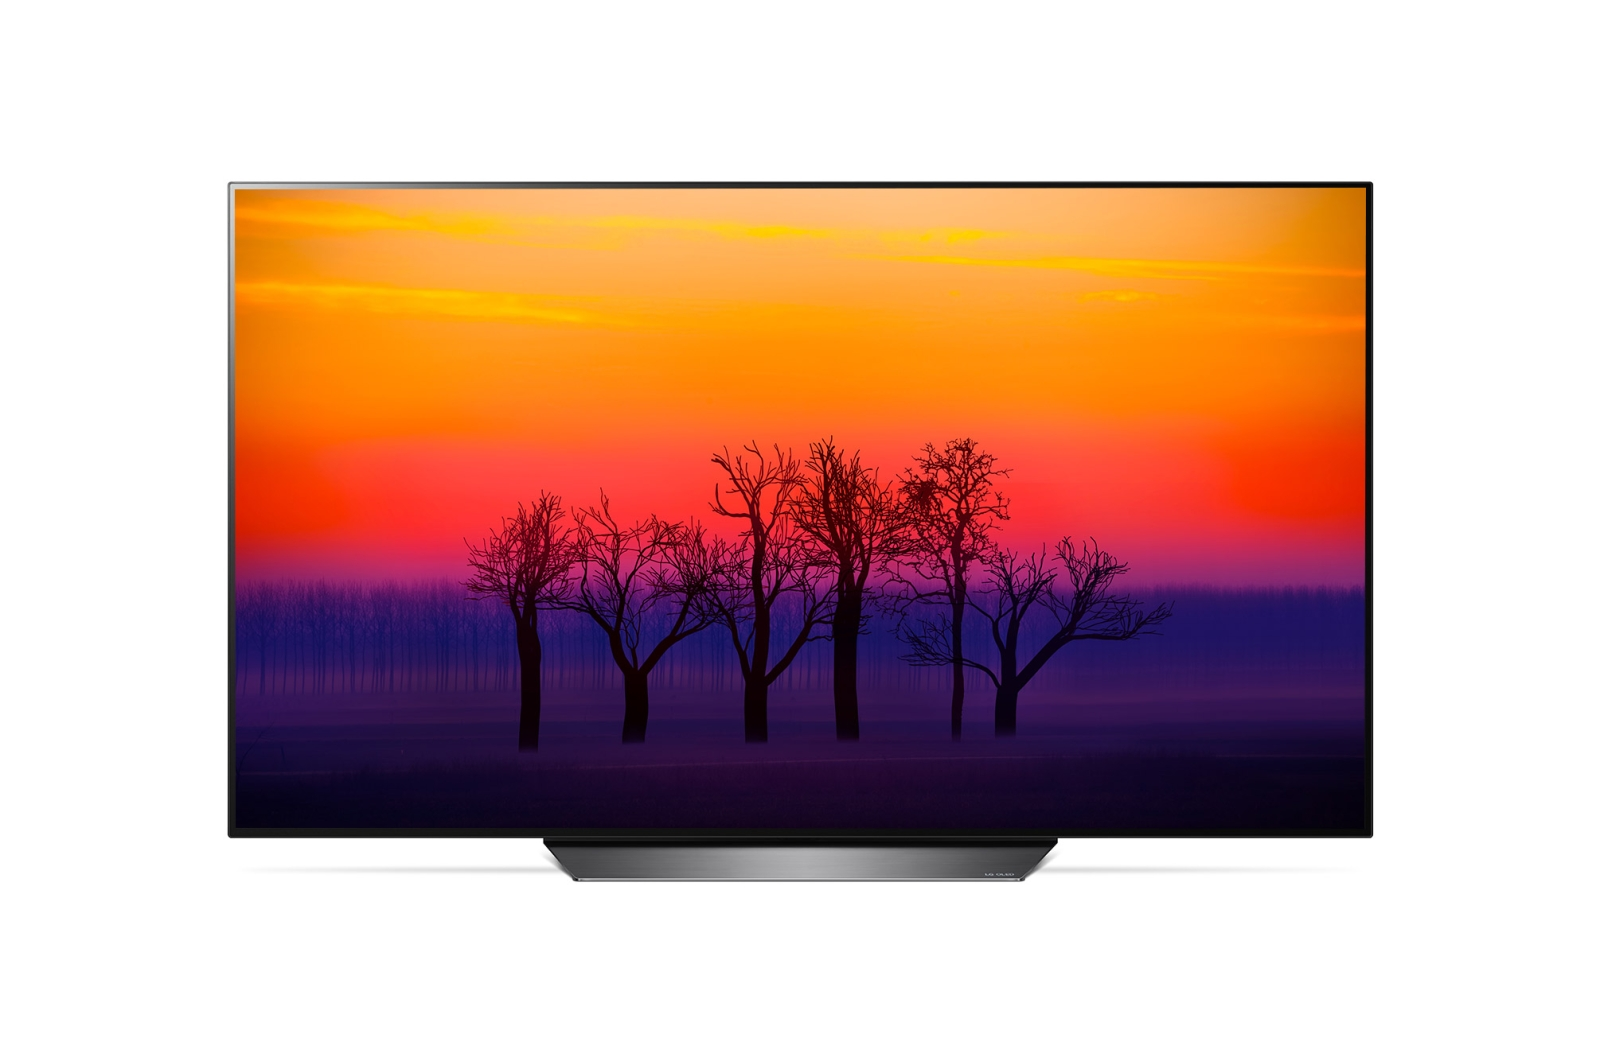 Televizor OLED LG Smart TV OLED65B8PLA 164cm 4K Ultra HD Negru